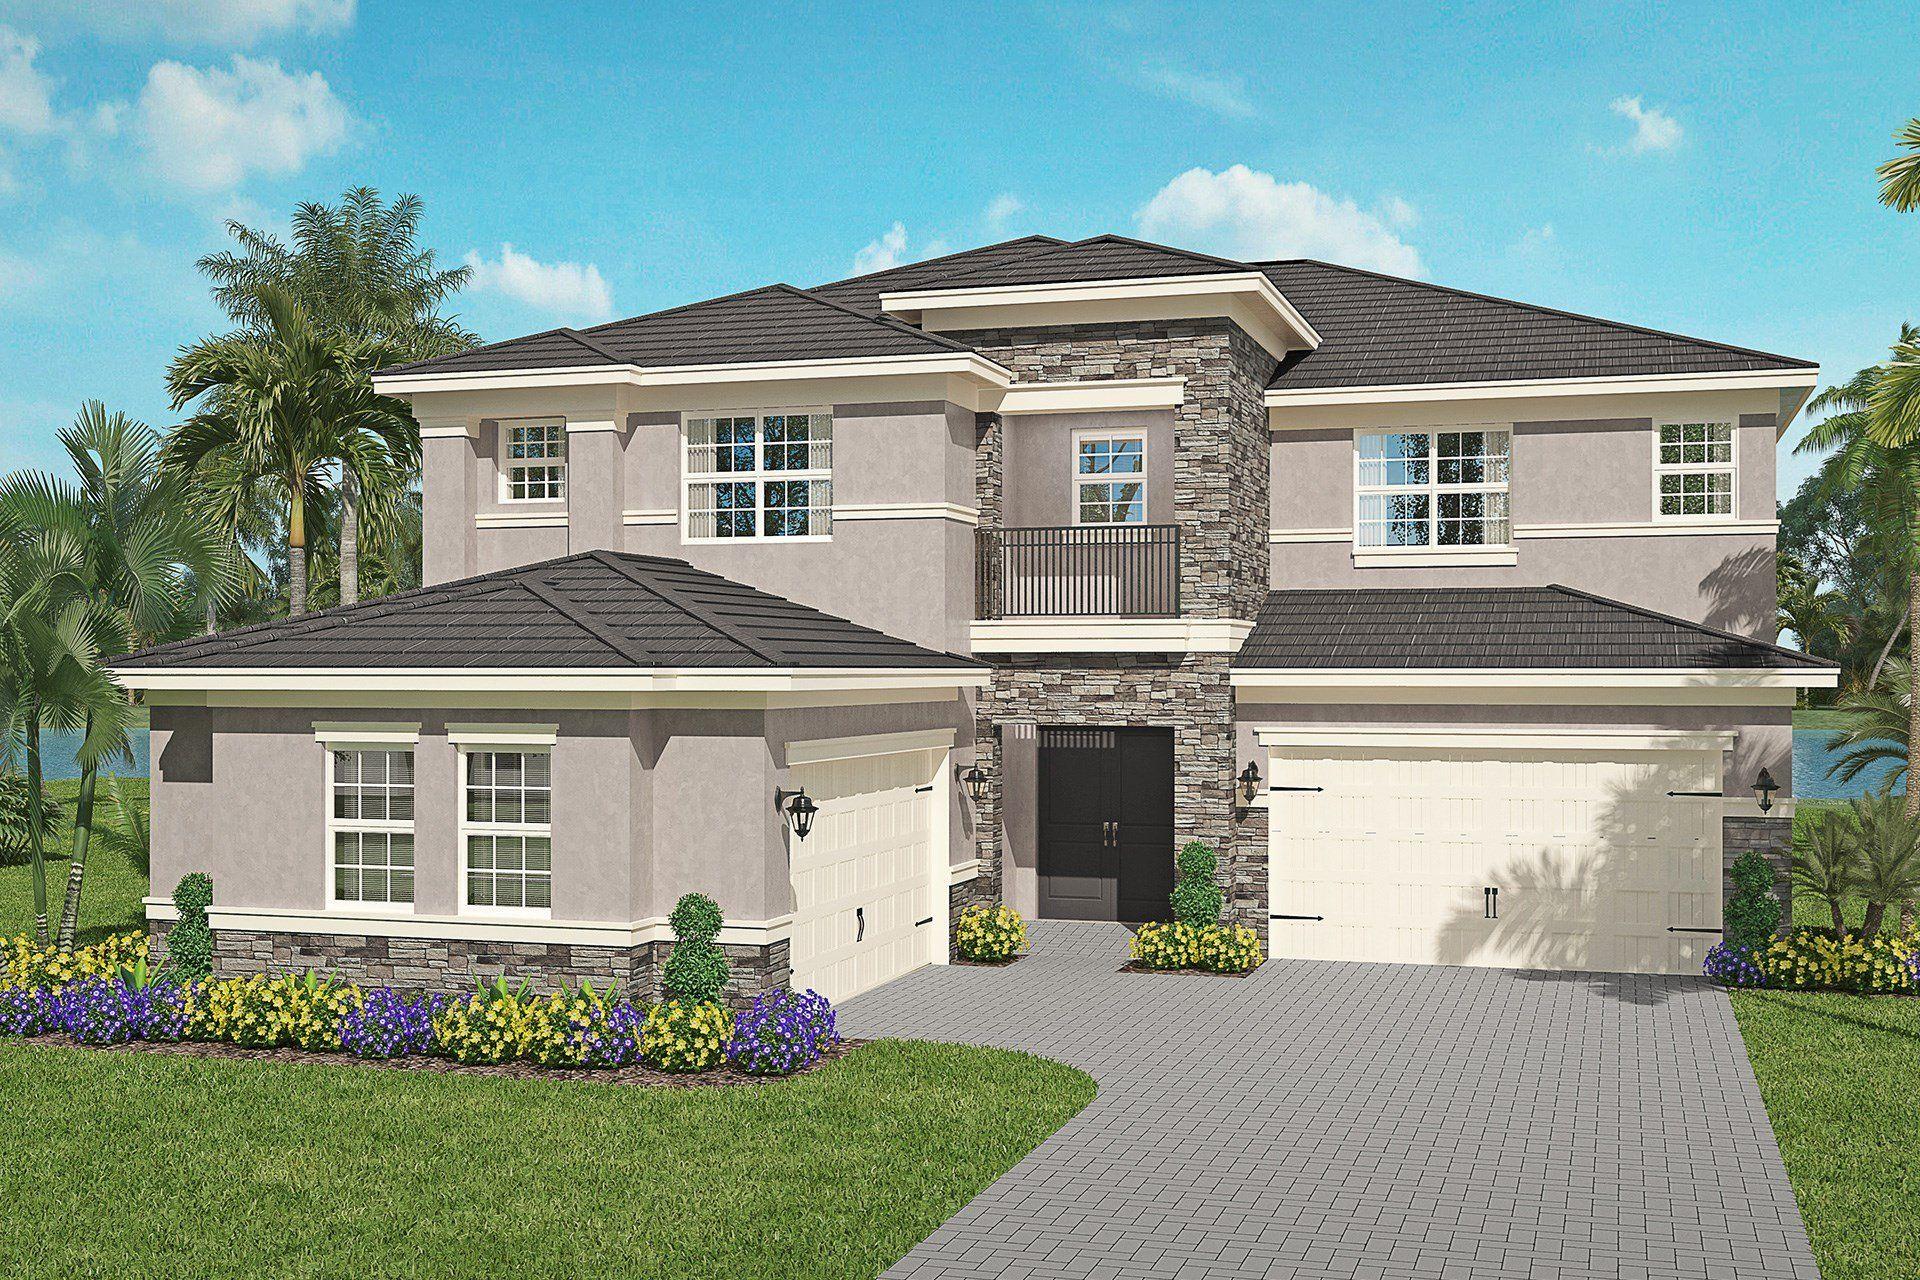 Garnet Plan Florida Real Estate Gl Homes In 2020 Florida Real Estate Flat Roof Tiles Interior Light Fixtures